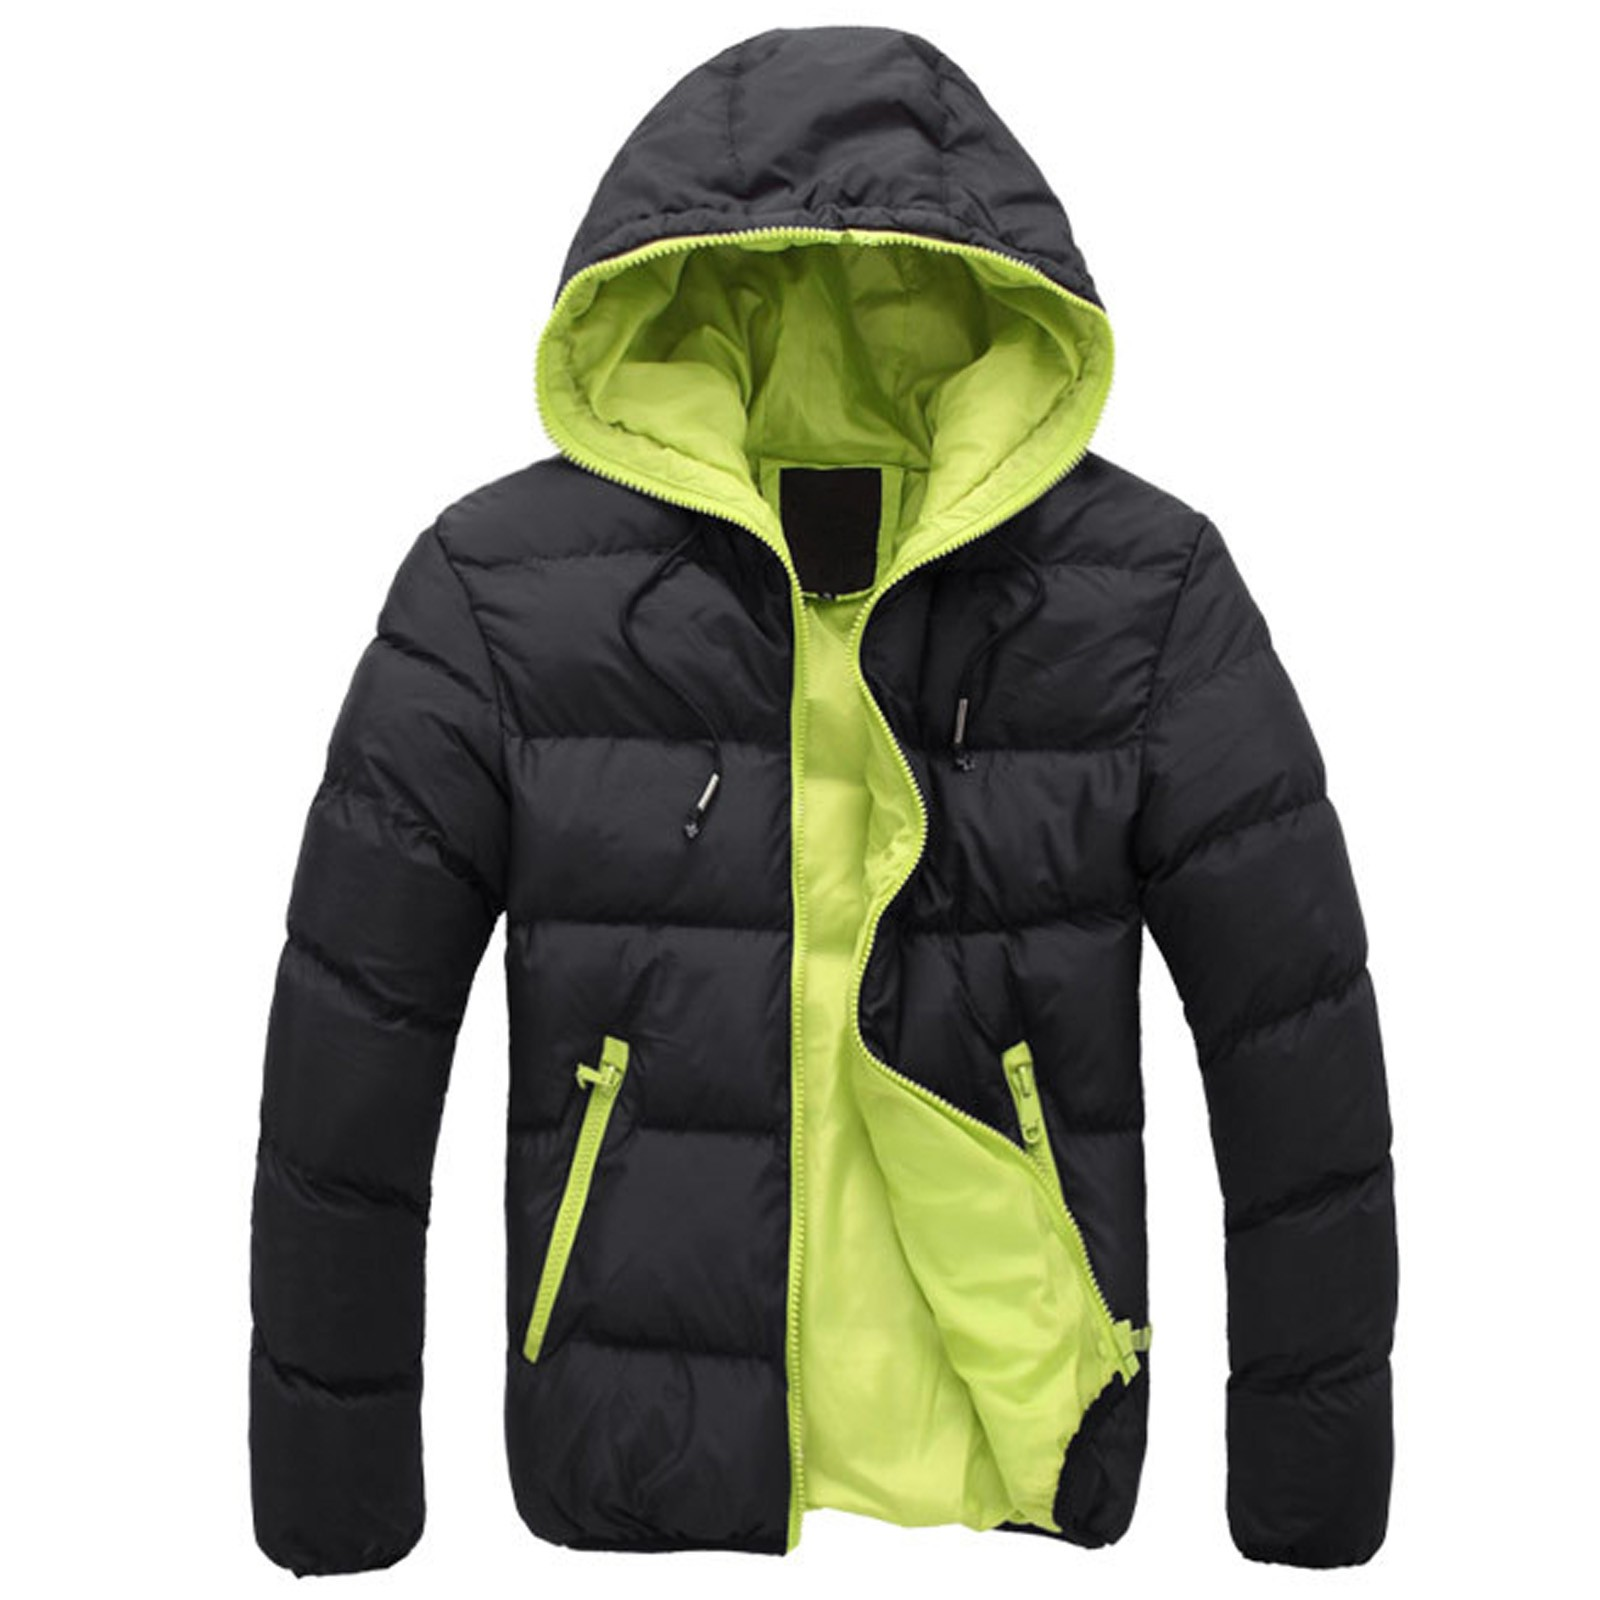 Jacket Hoodie Parkas Men Winter Coats Outwear Cotton-Padded Zipper Hip-Hop Male Solid